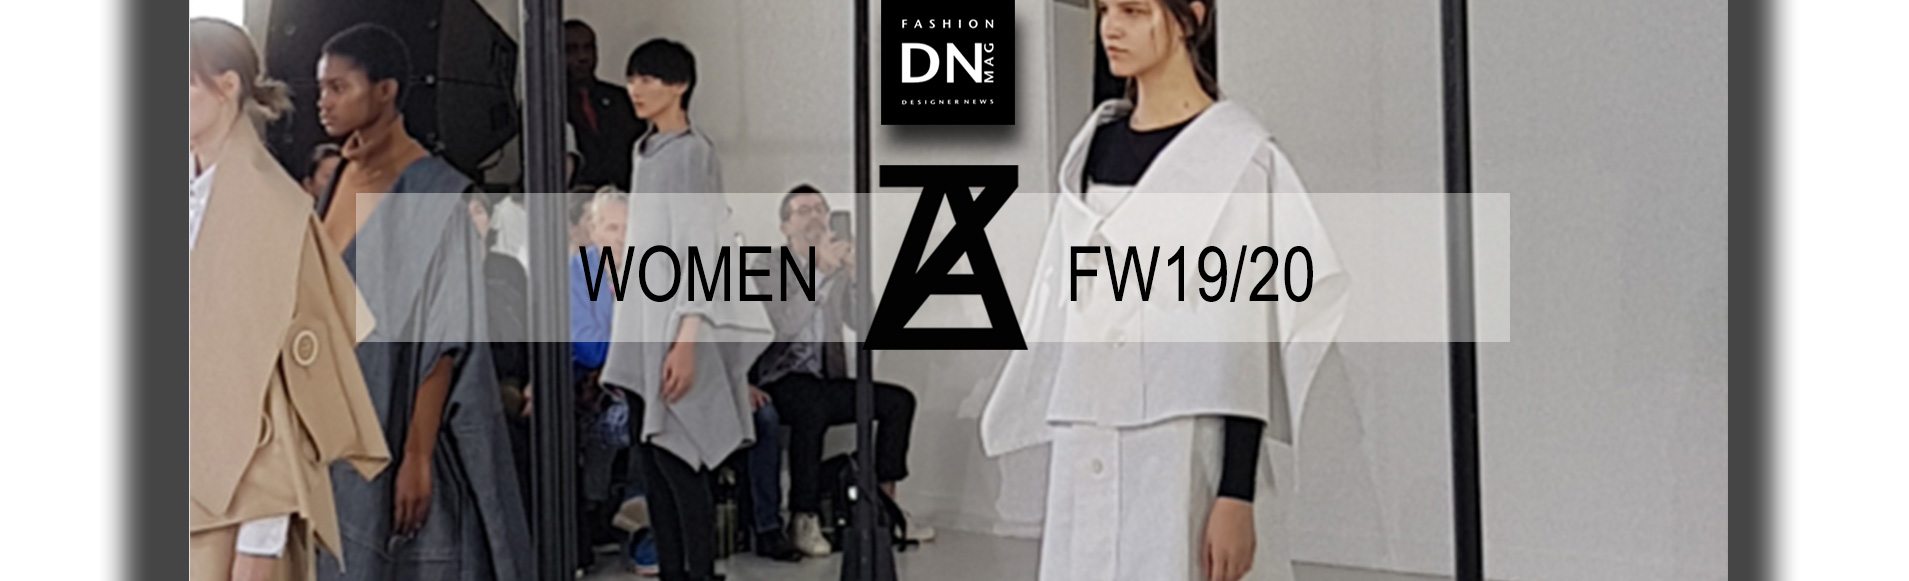 DNMAG-ANREALAGE-RTW-2019-FW2019-2020